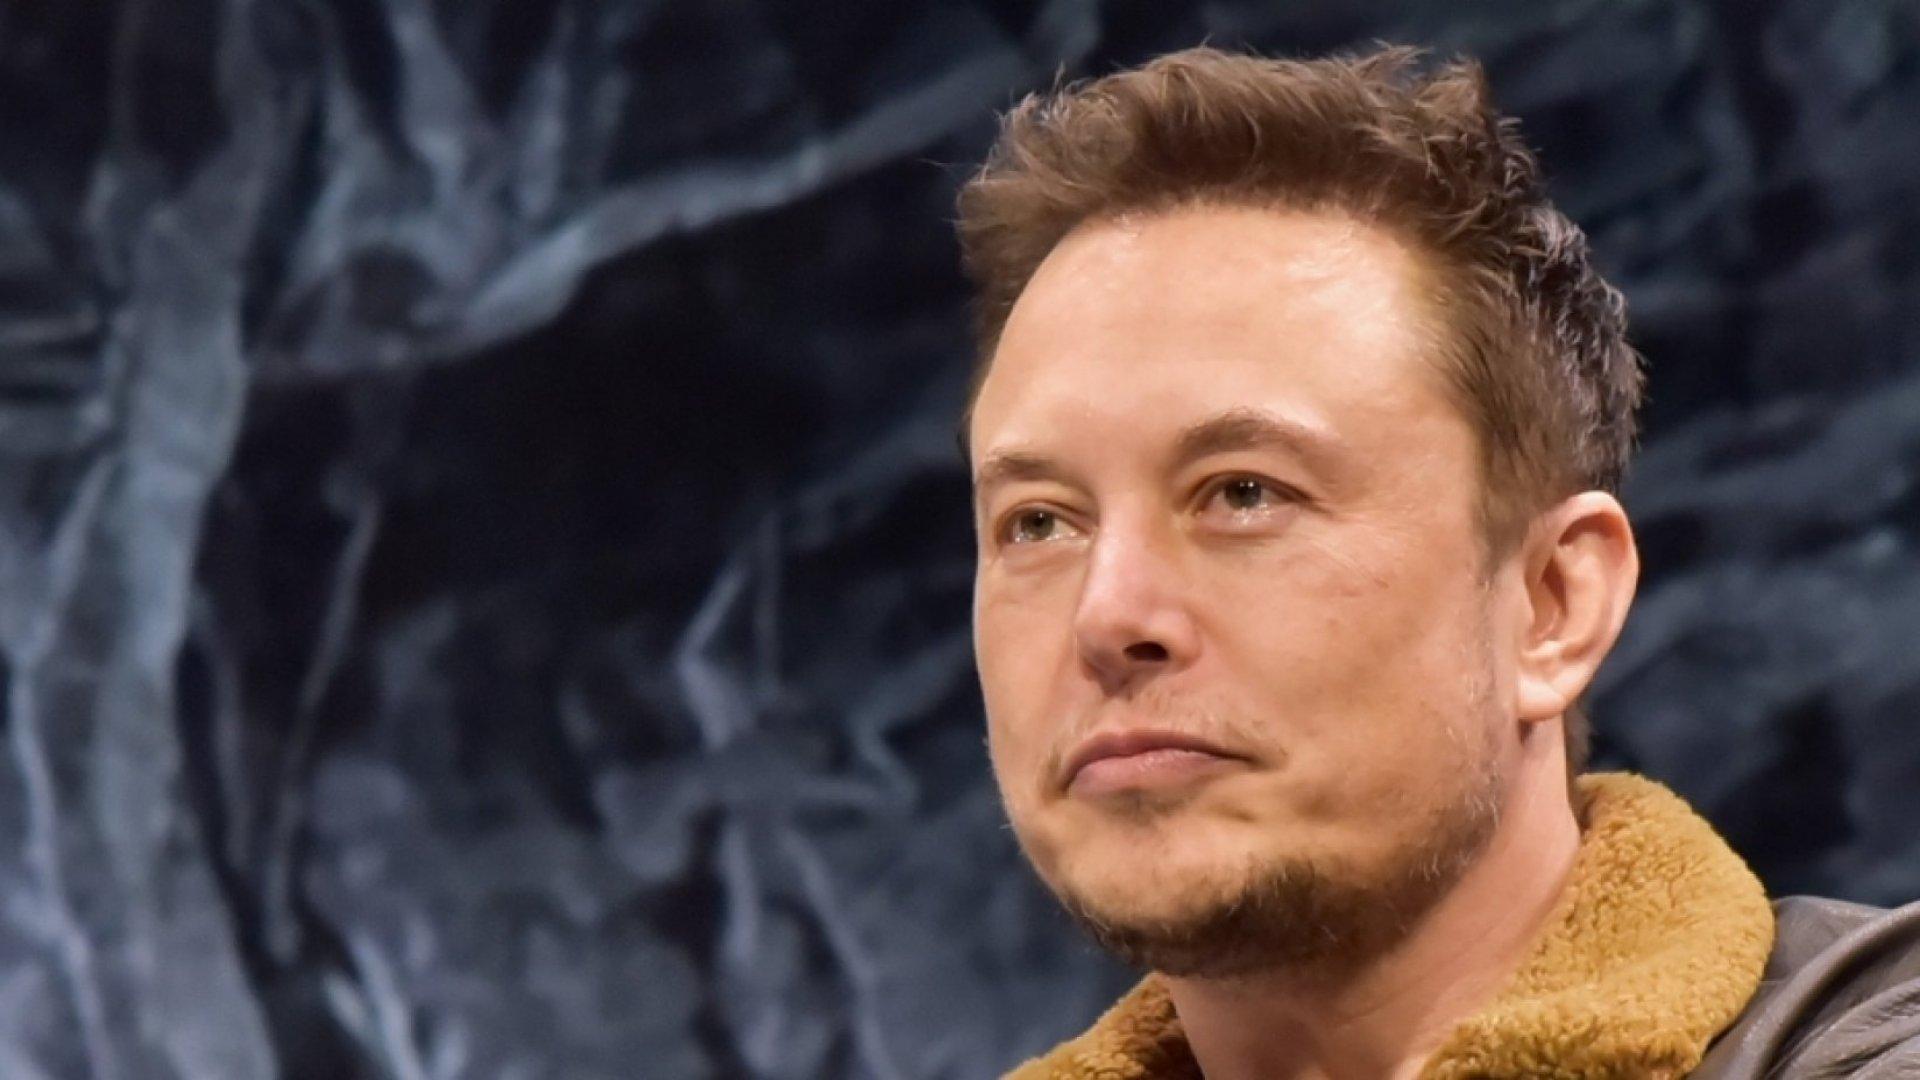 Elon Musk Cut the Gordian Knot of Corporate Spending